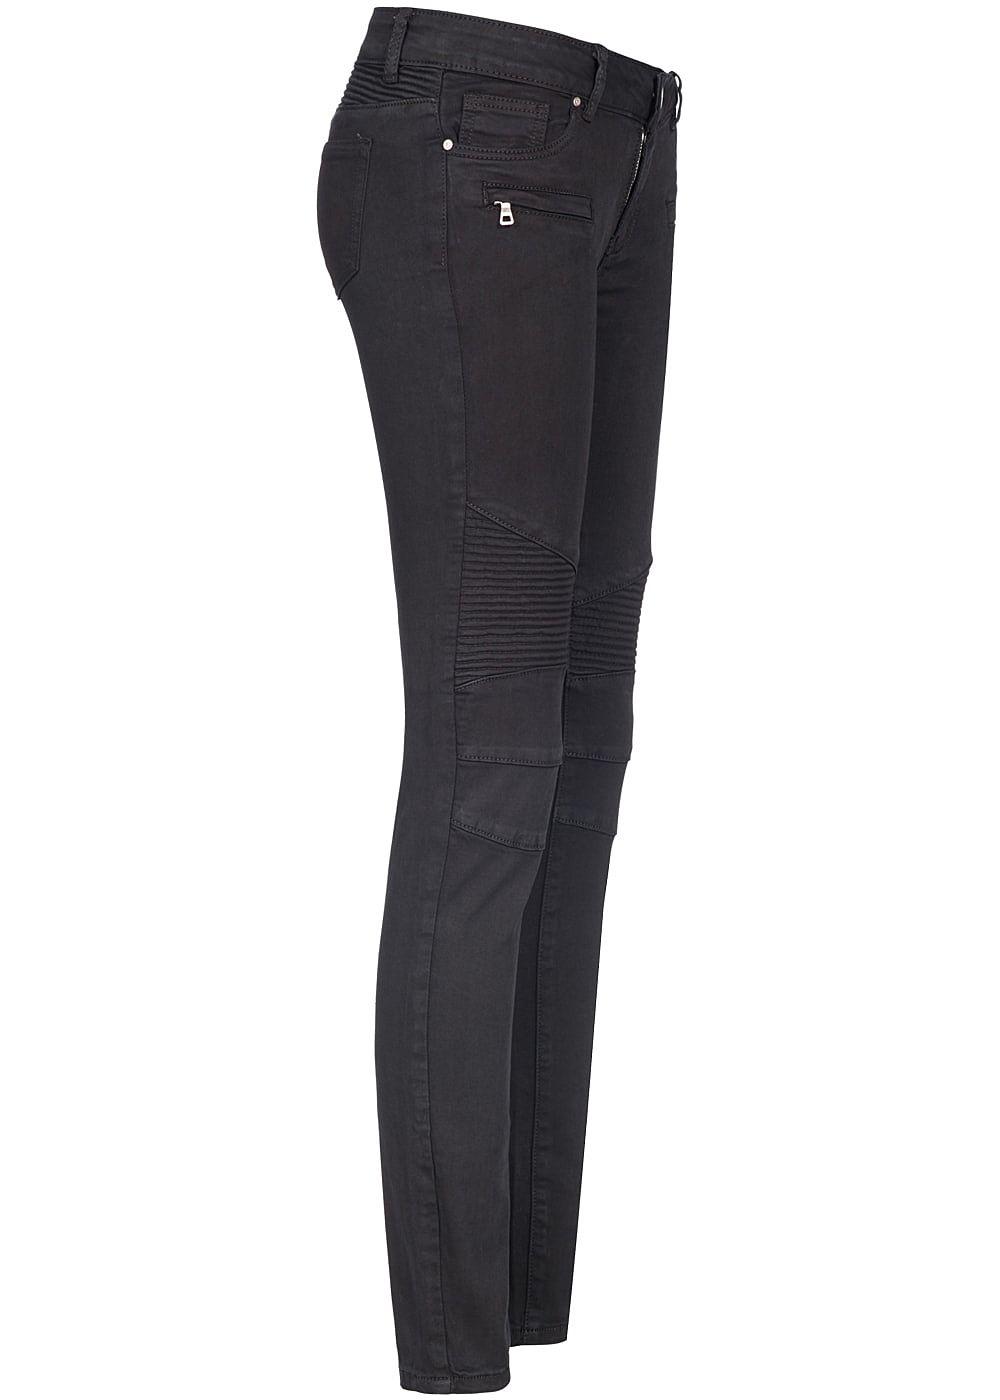 hailys damen jeans biker style 5 pockets und zipper. Black Bedroom Furniture Sets. Home Design Ideas